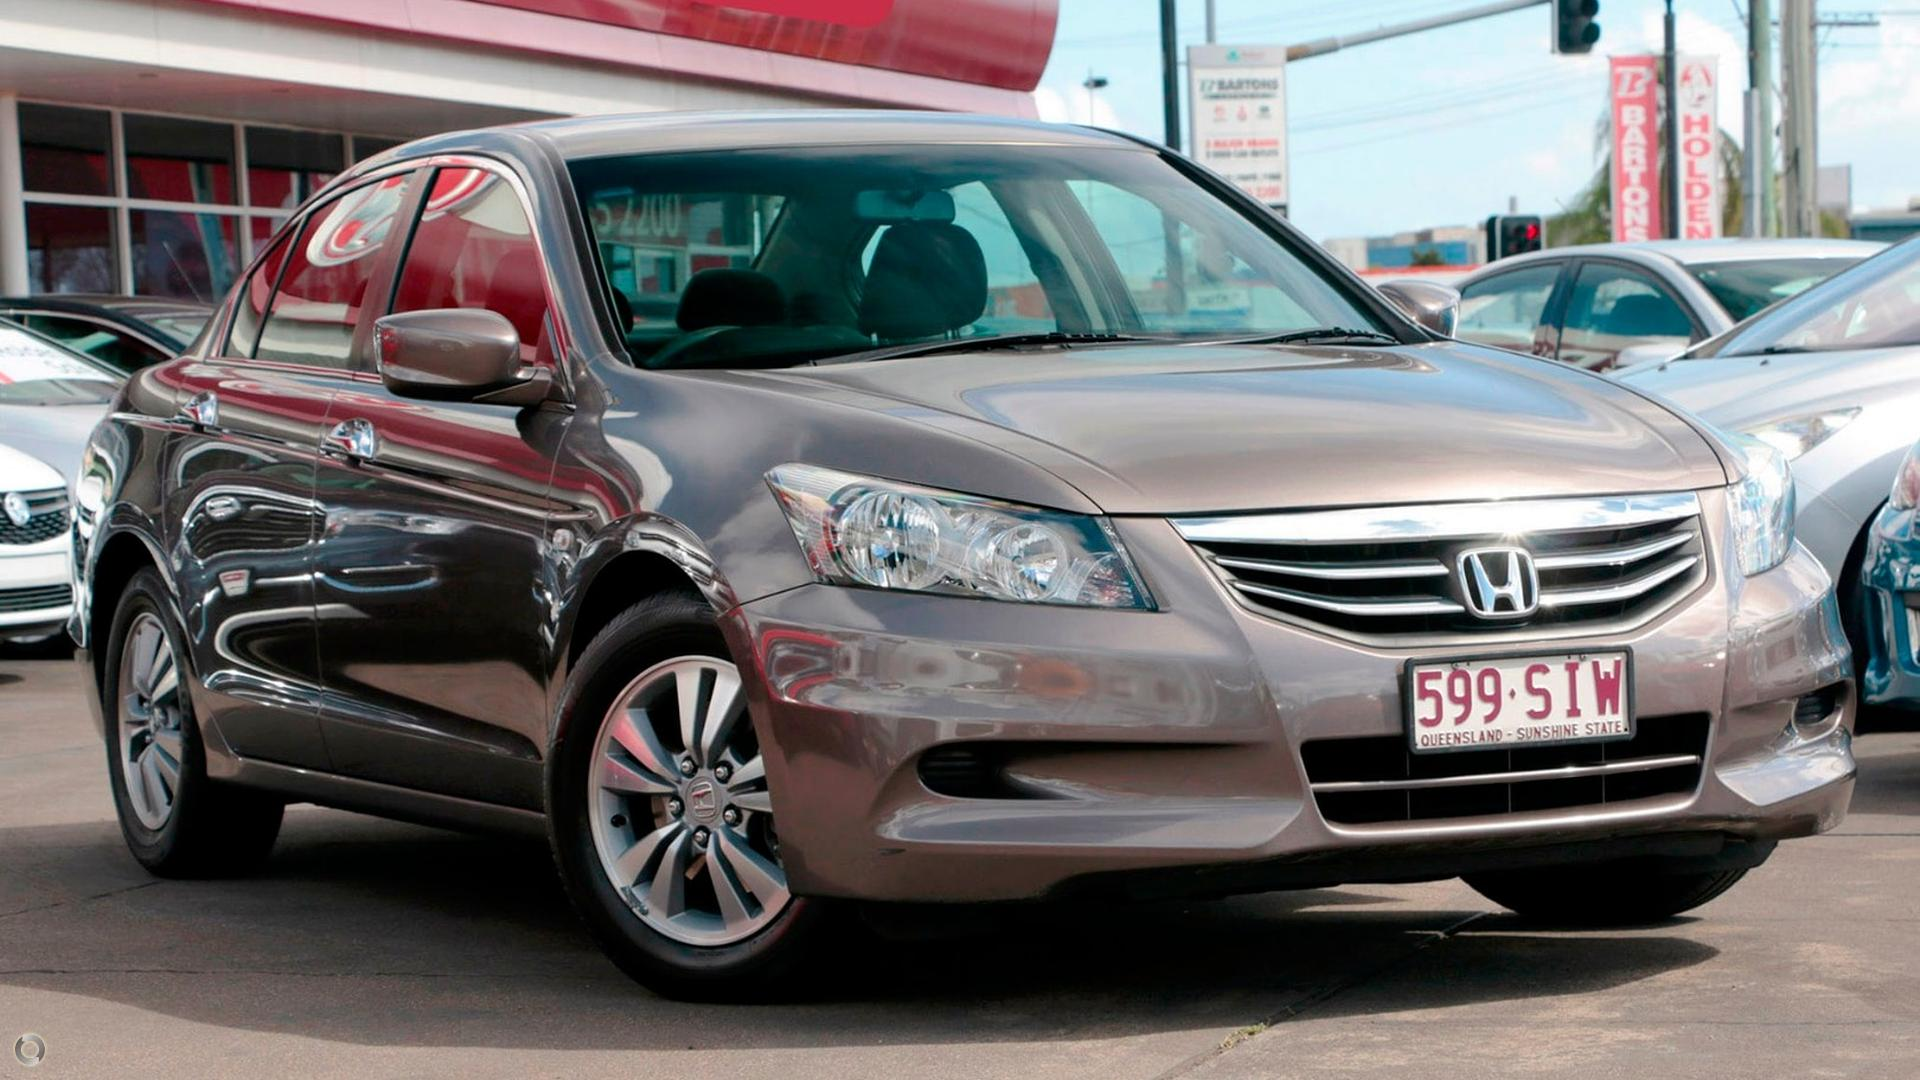 2012 Honda Accord VTi 8th Gen